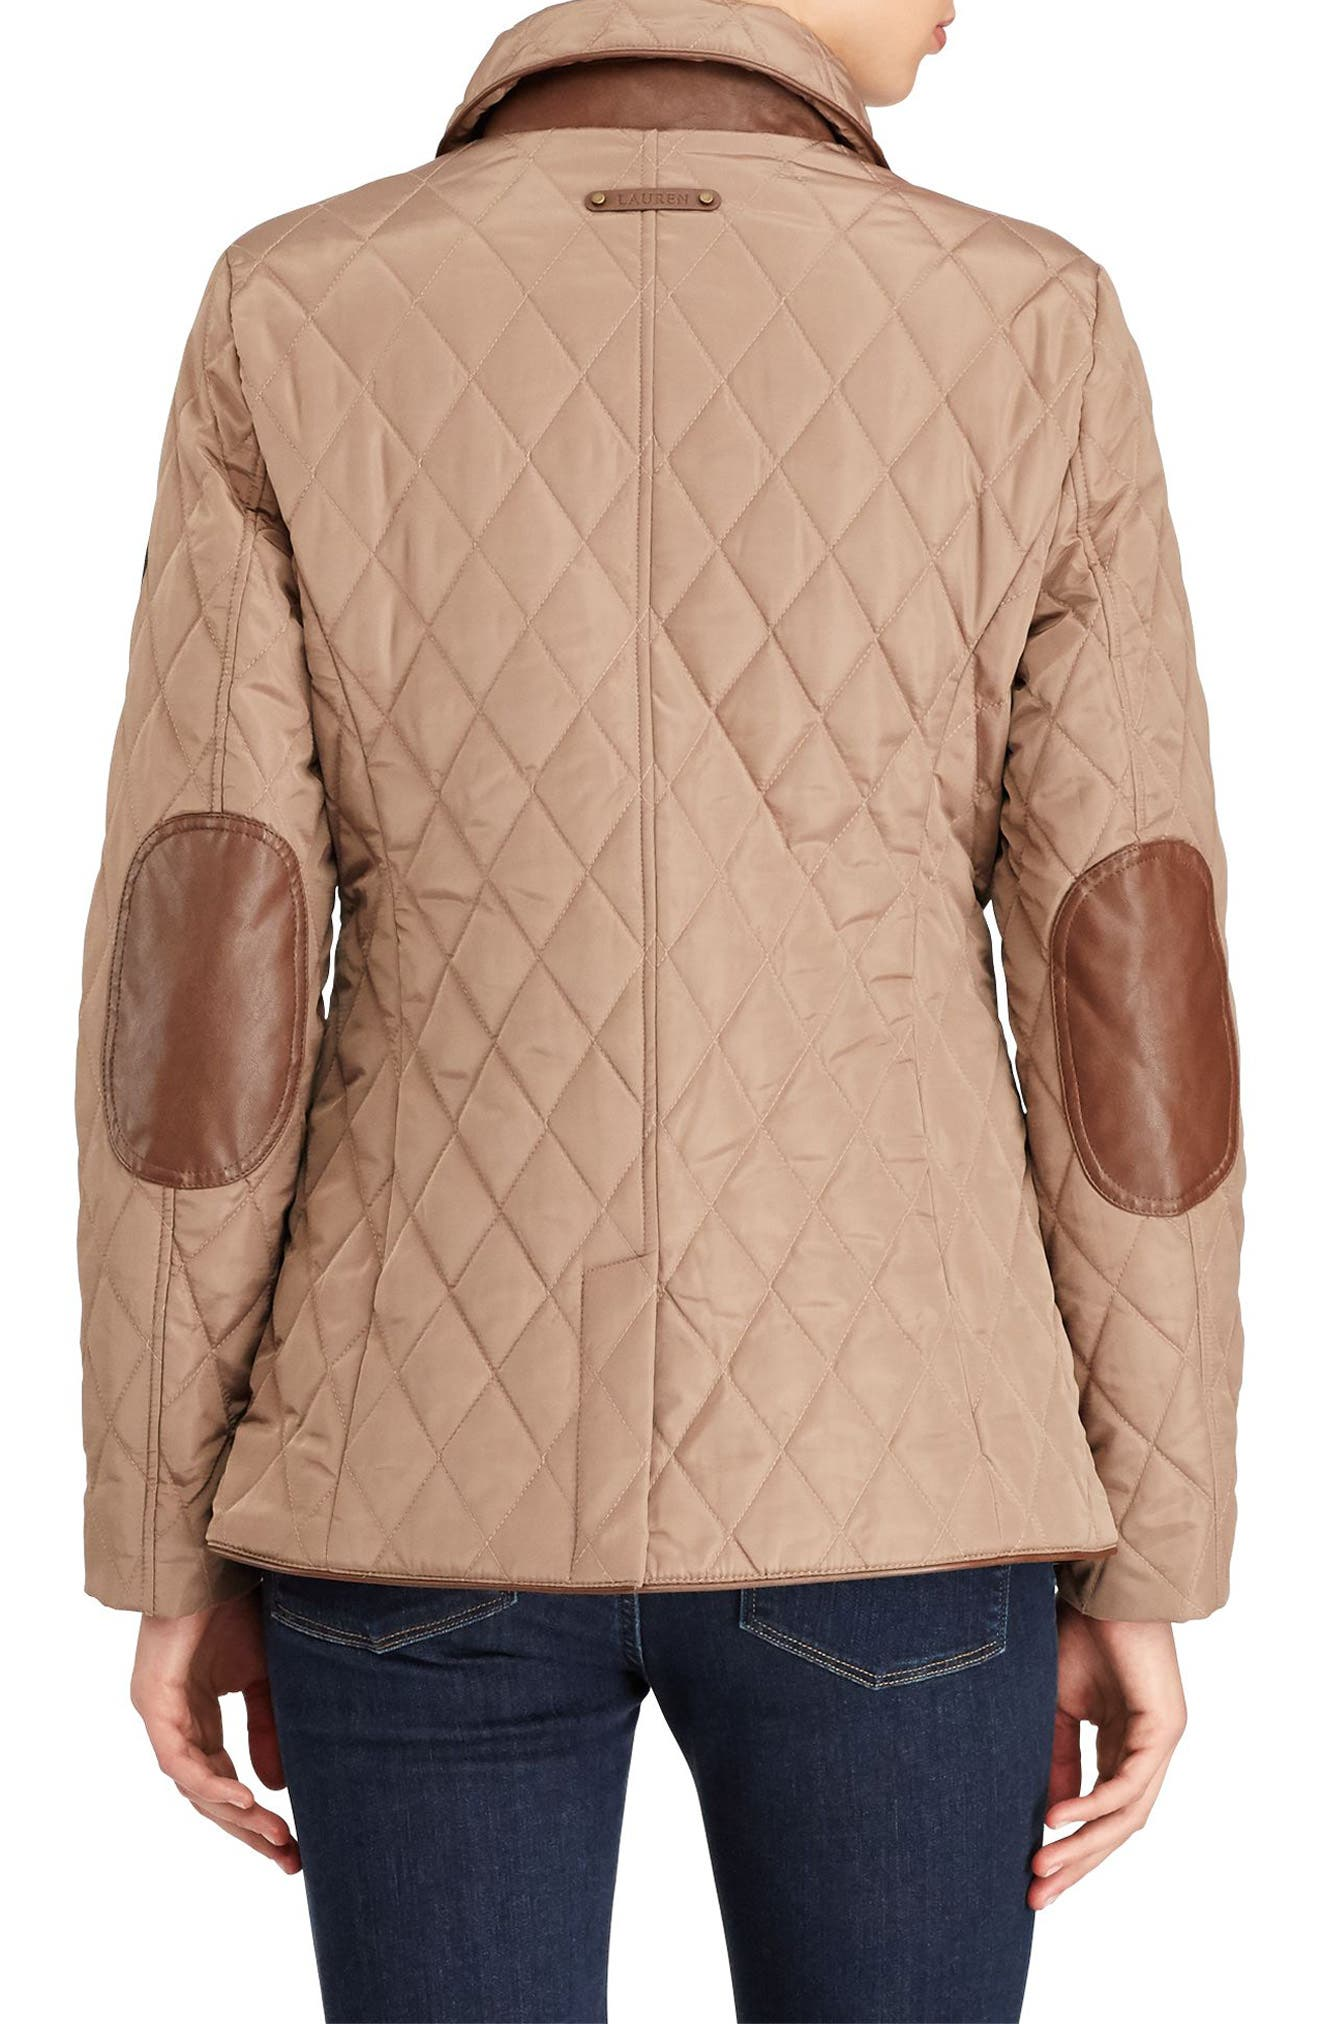 Alternate Image 3  - Lauren Ralph Lauren Faux Leather Trim Quilted Jacket (Regular & Petite)